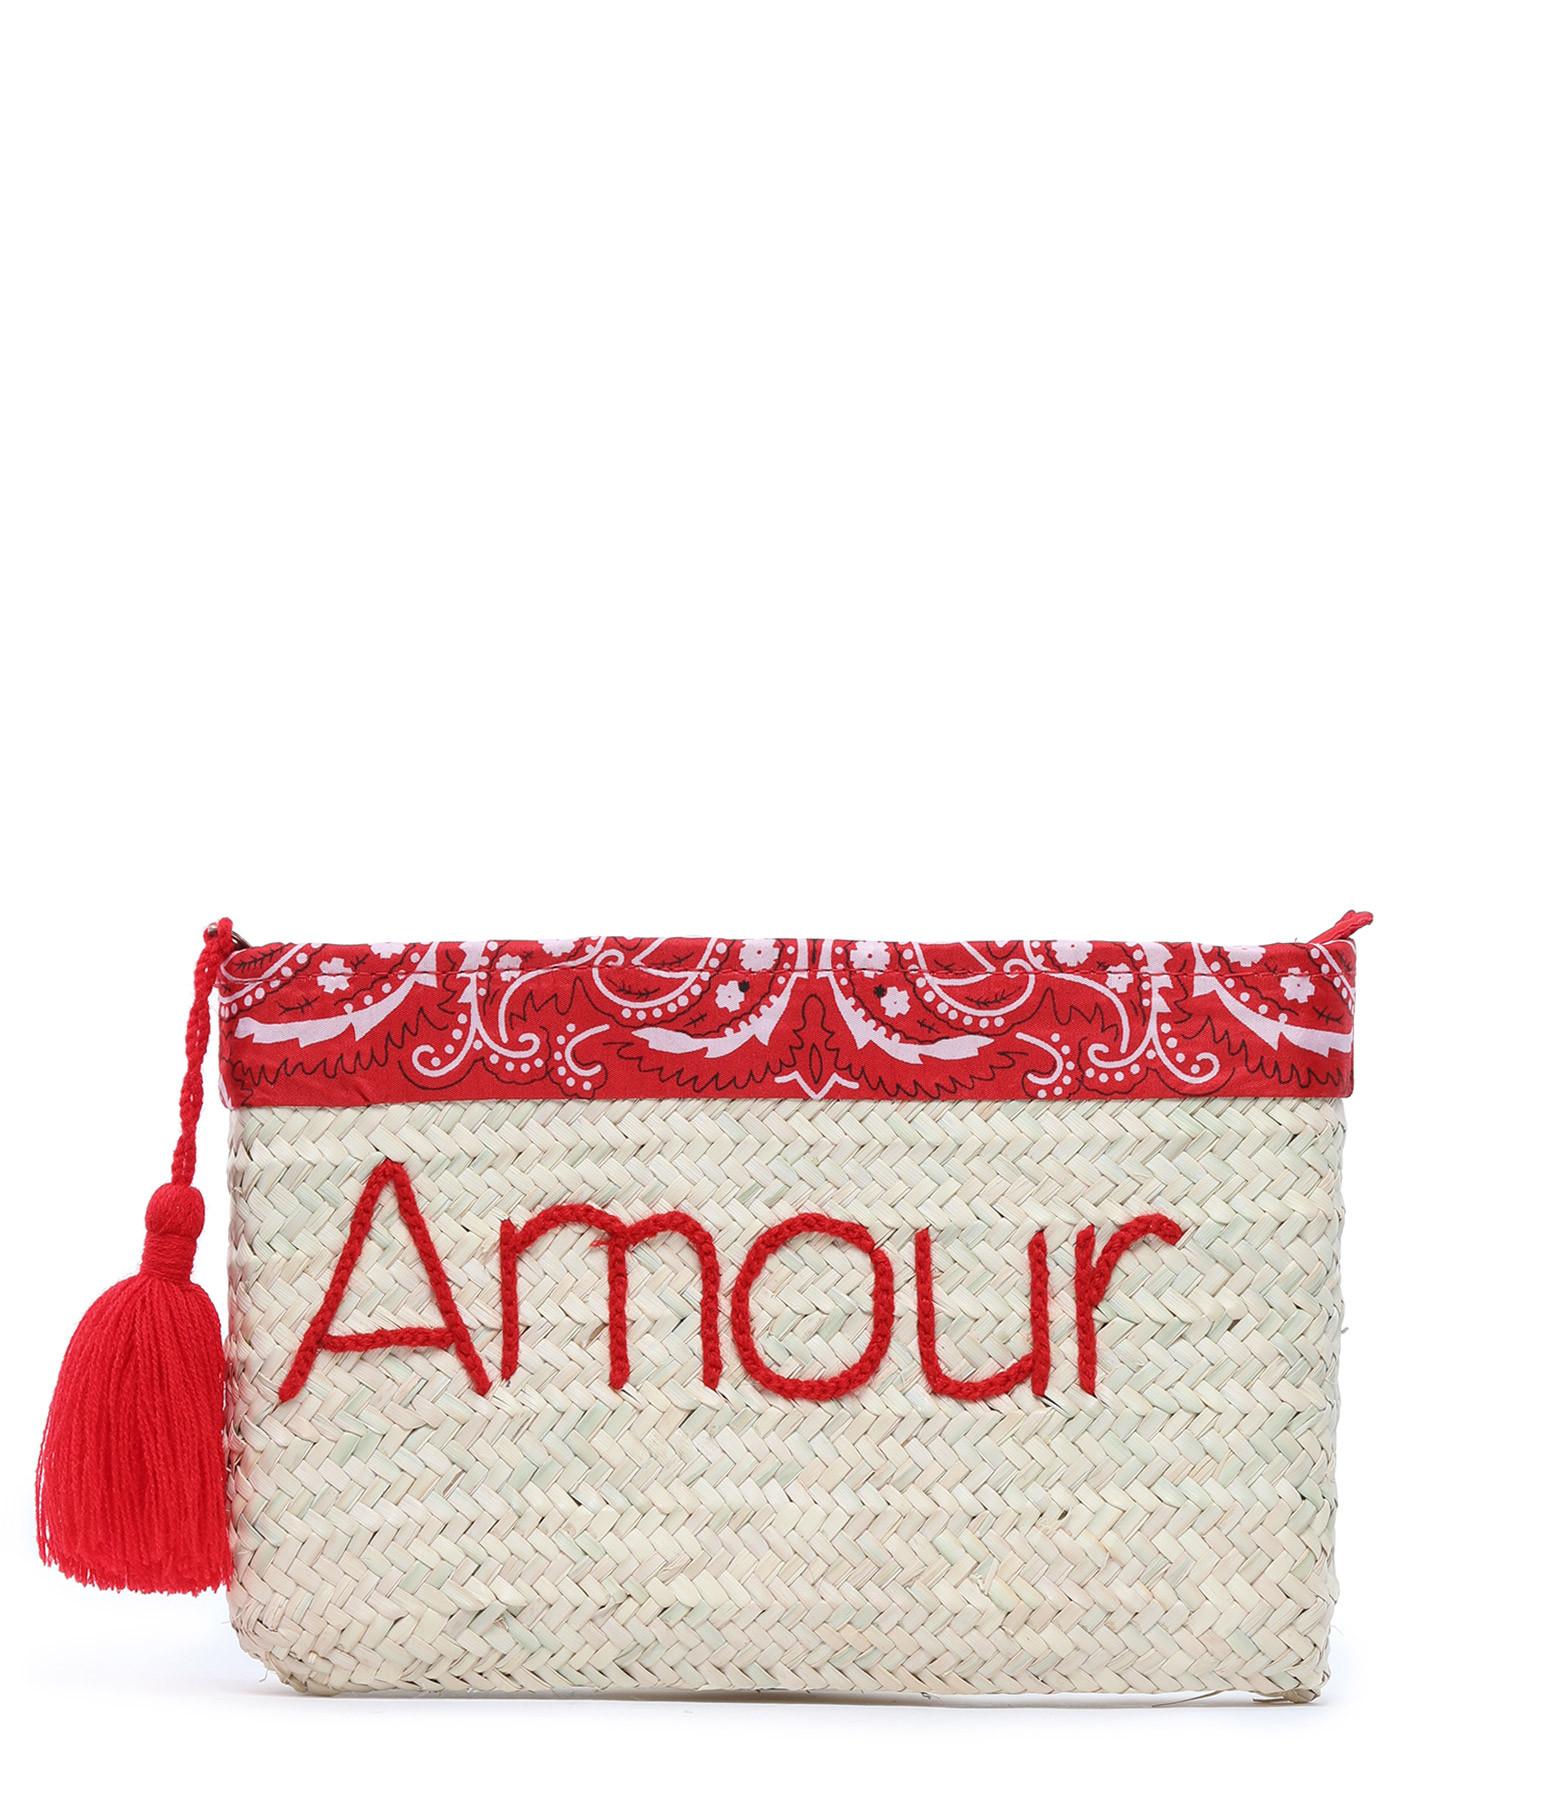 ANATA - Pochette Paille Amour Bandana Rouge